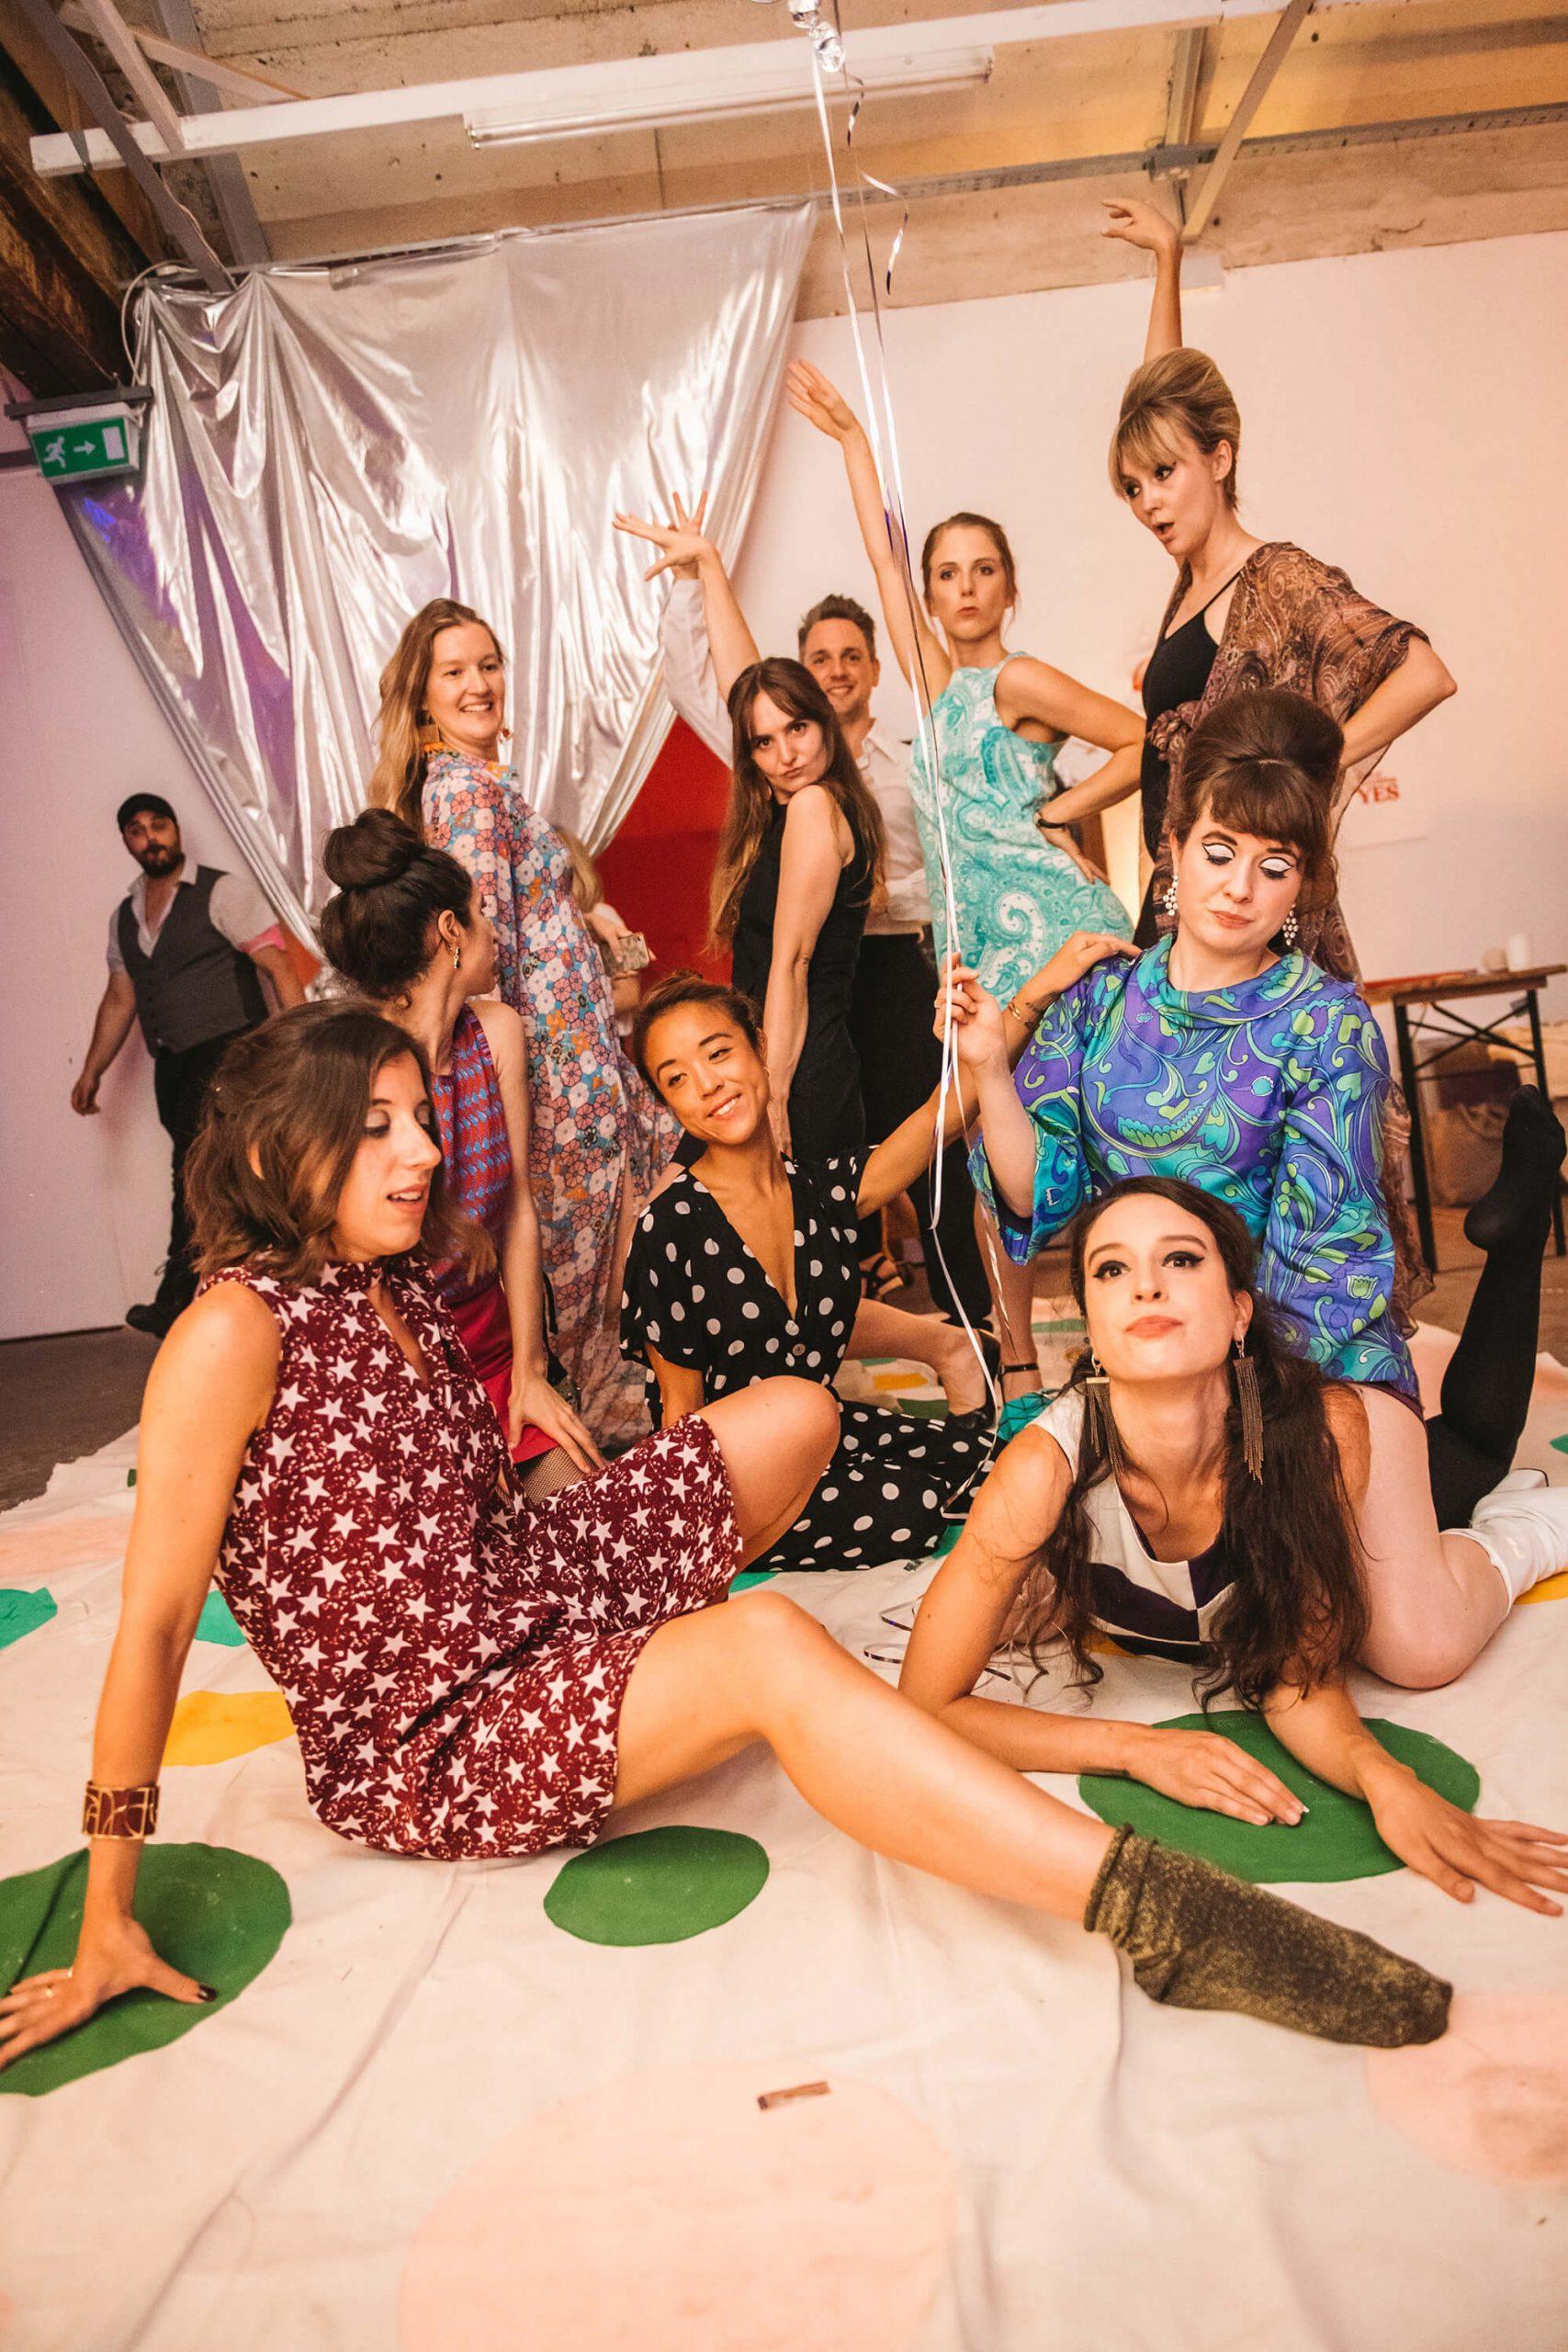 Women playing Twister at City Nights